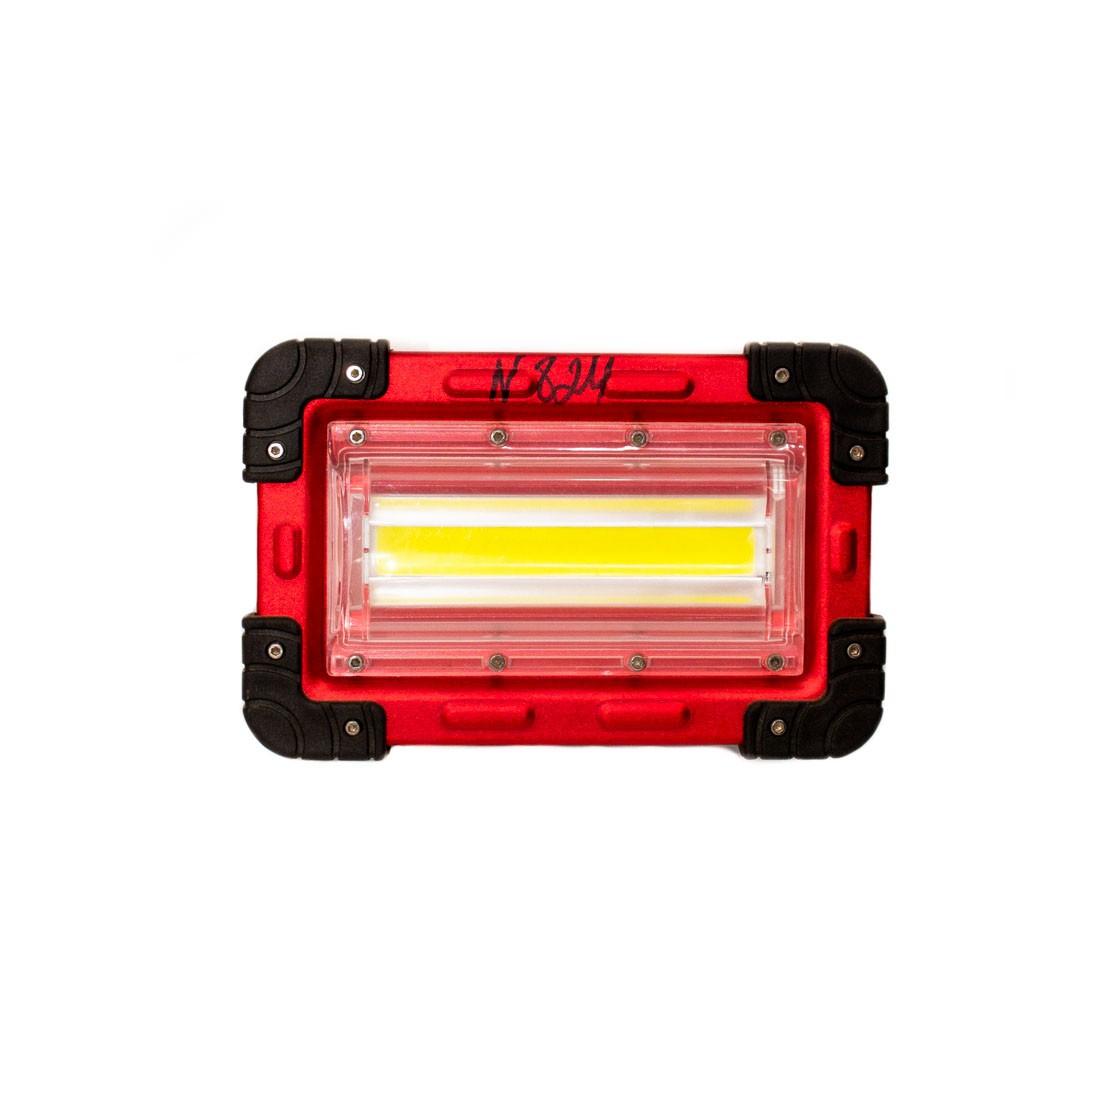 LED Лампа 30W с аккумулятором W824 оптом